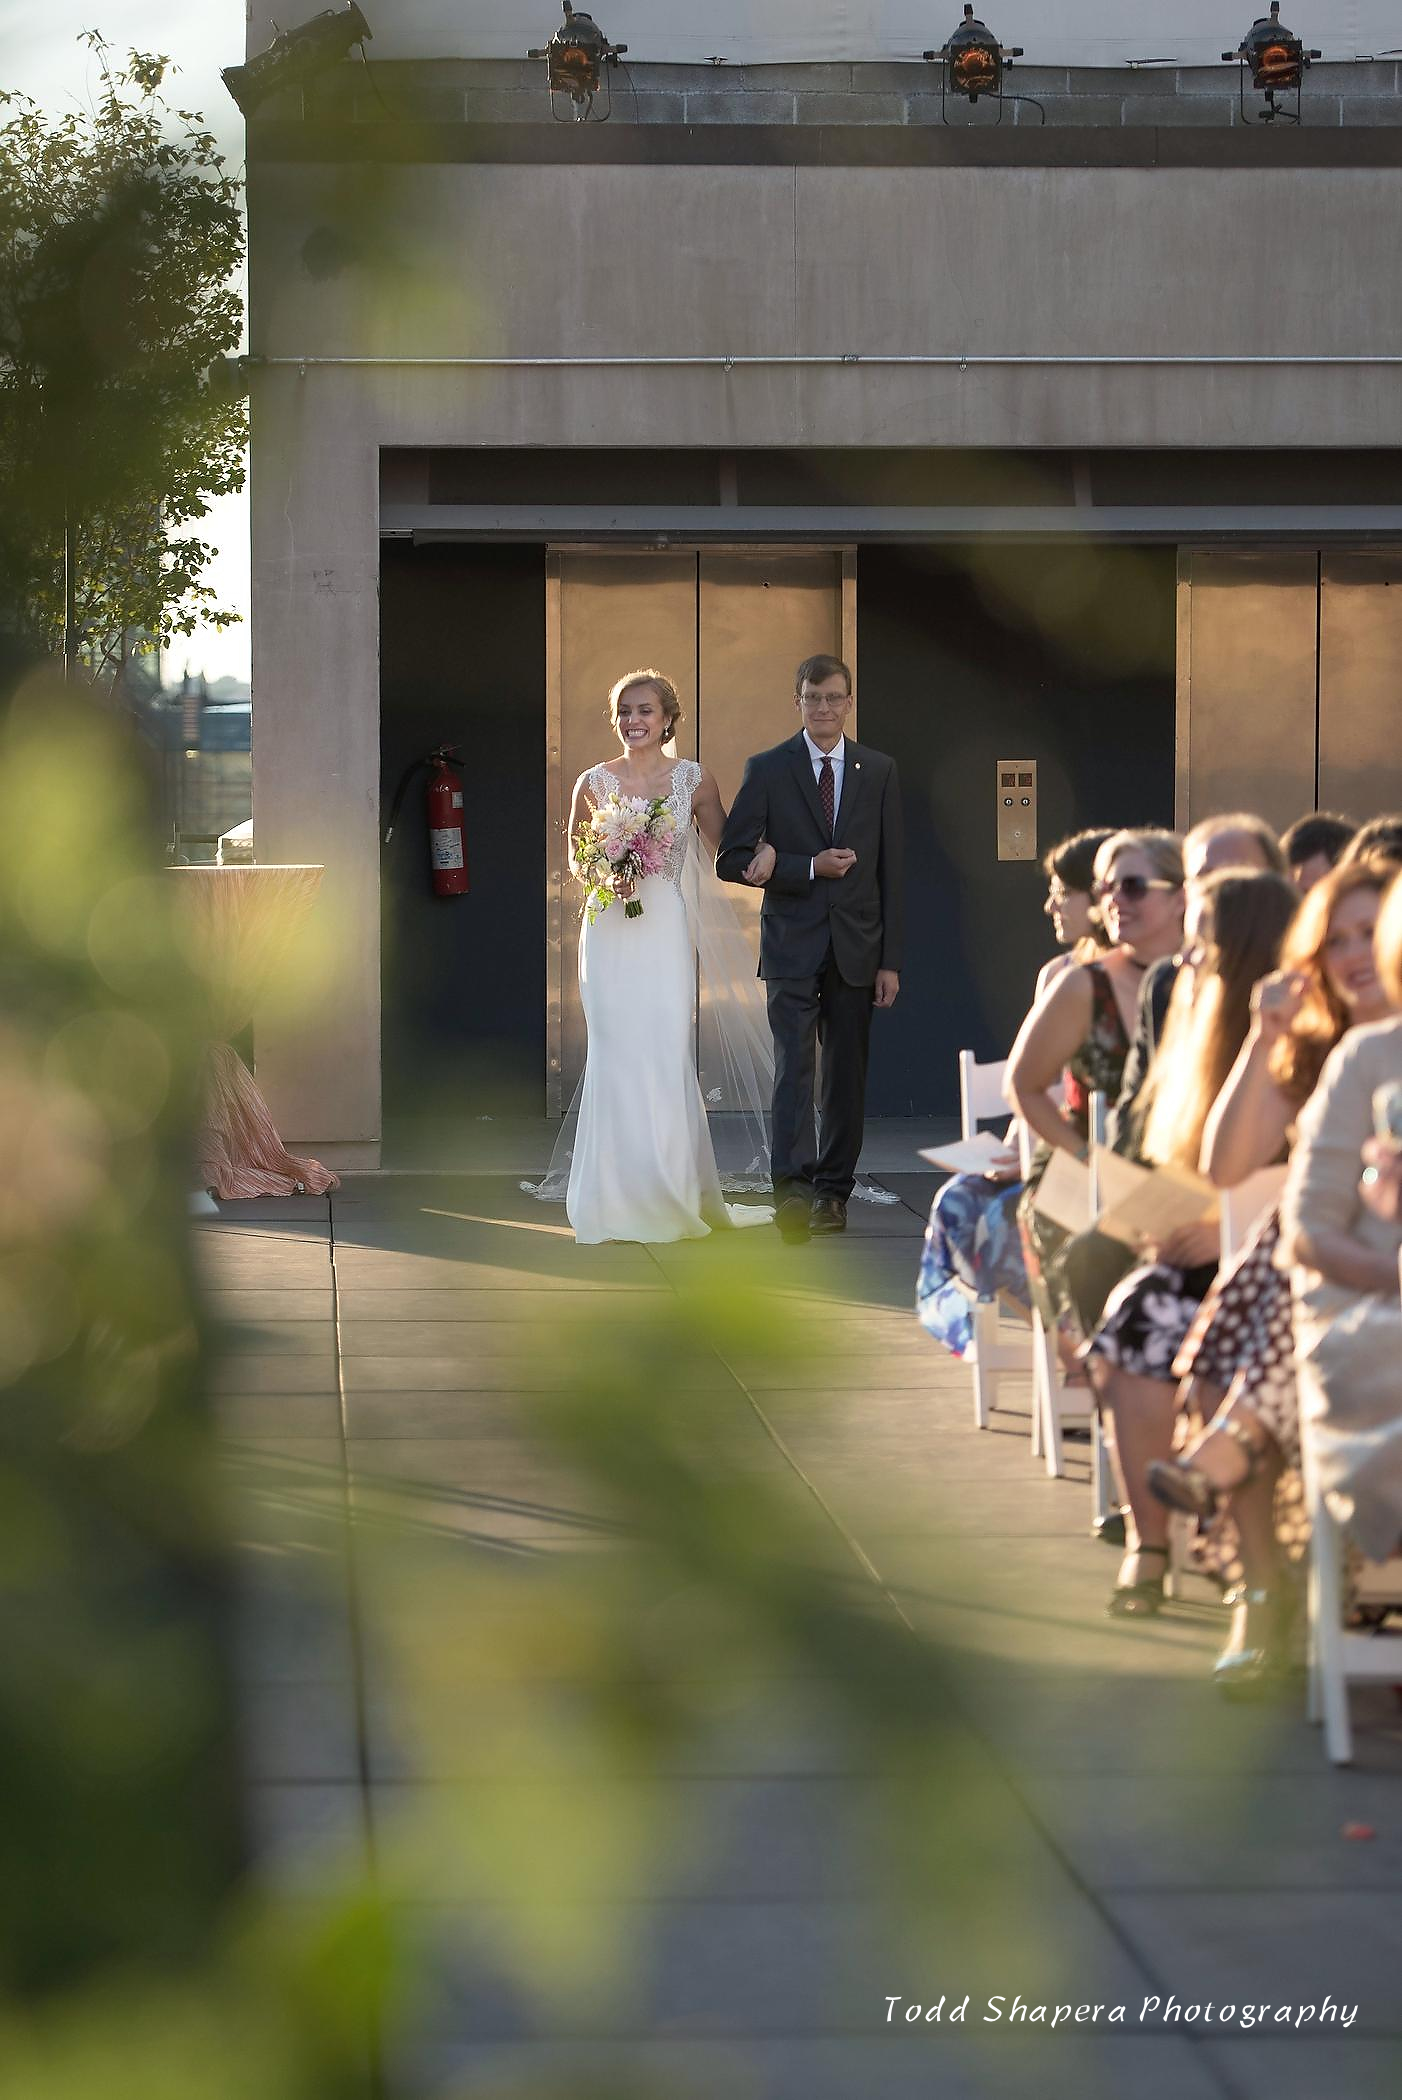 ROOFTOP WEDDING - Monique Banks Party